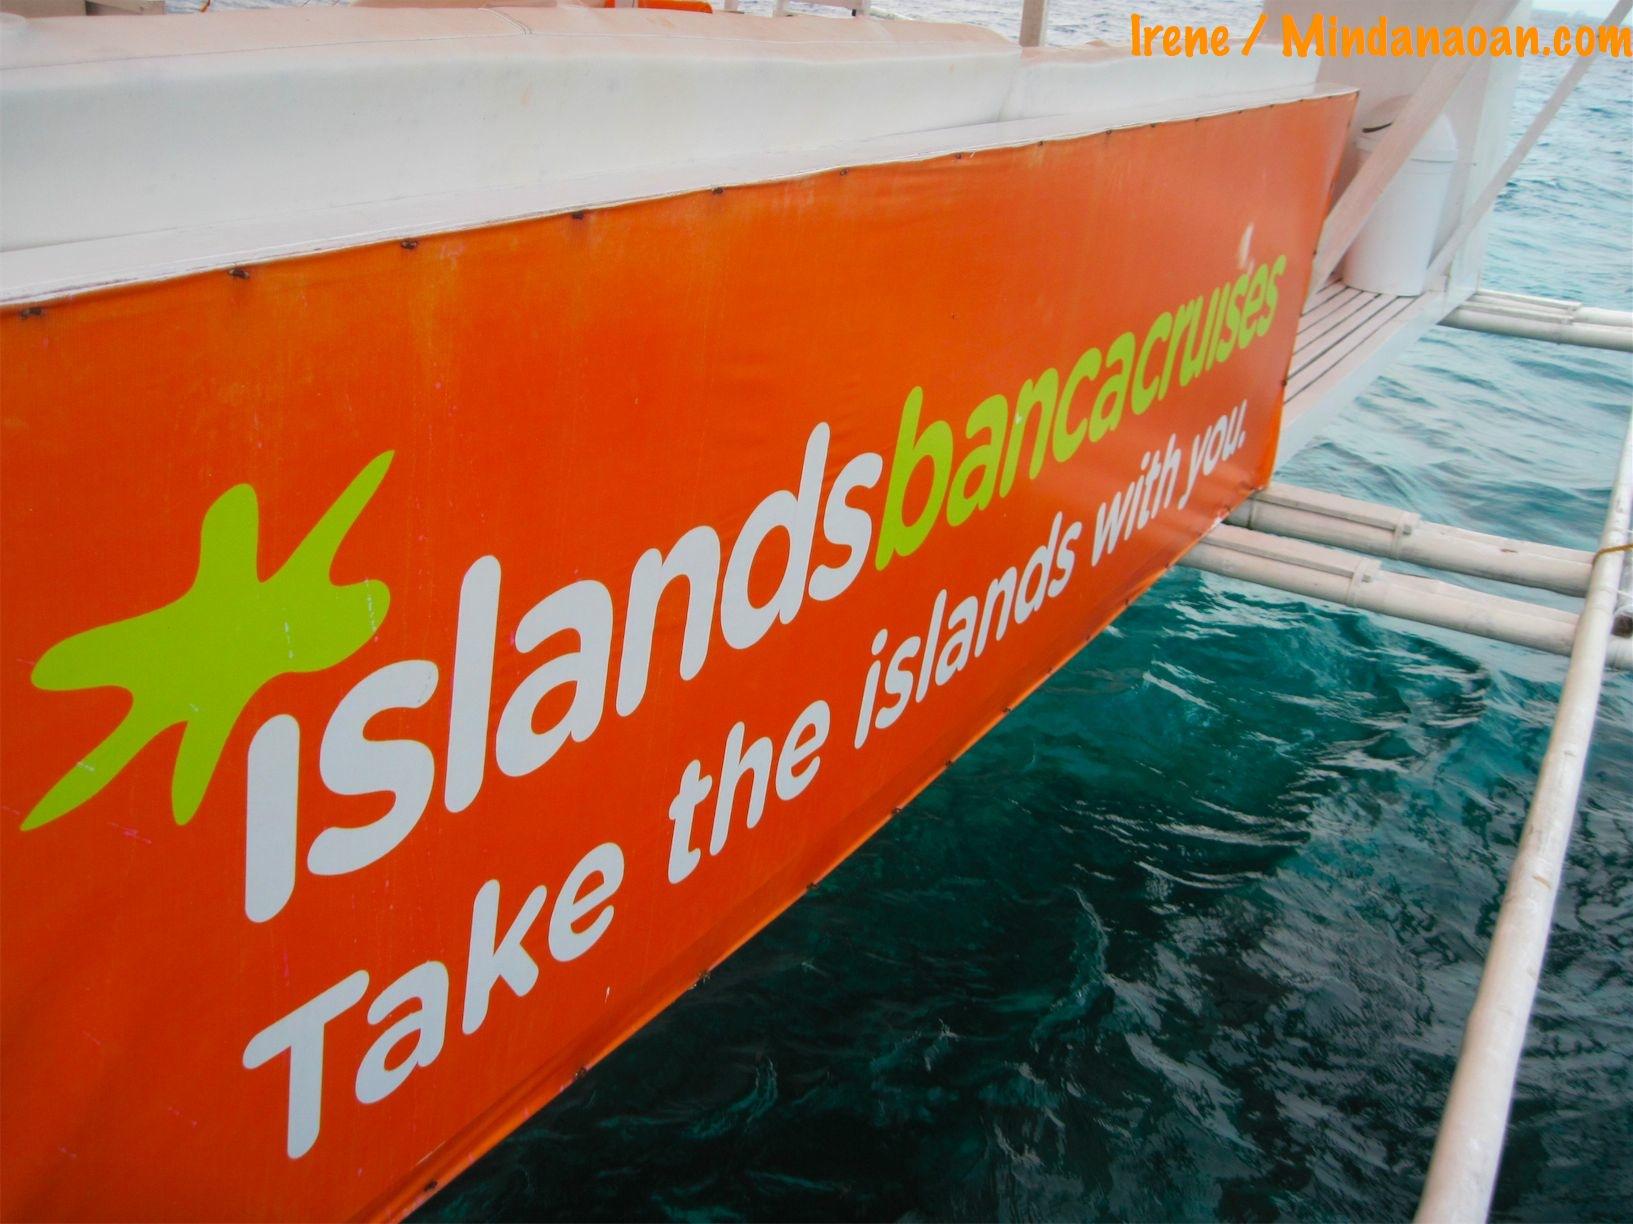 Cebu island hopping with Islands Banca Cruises